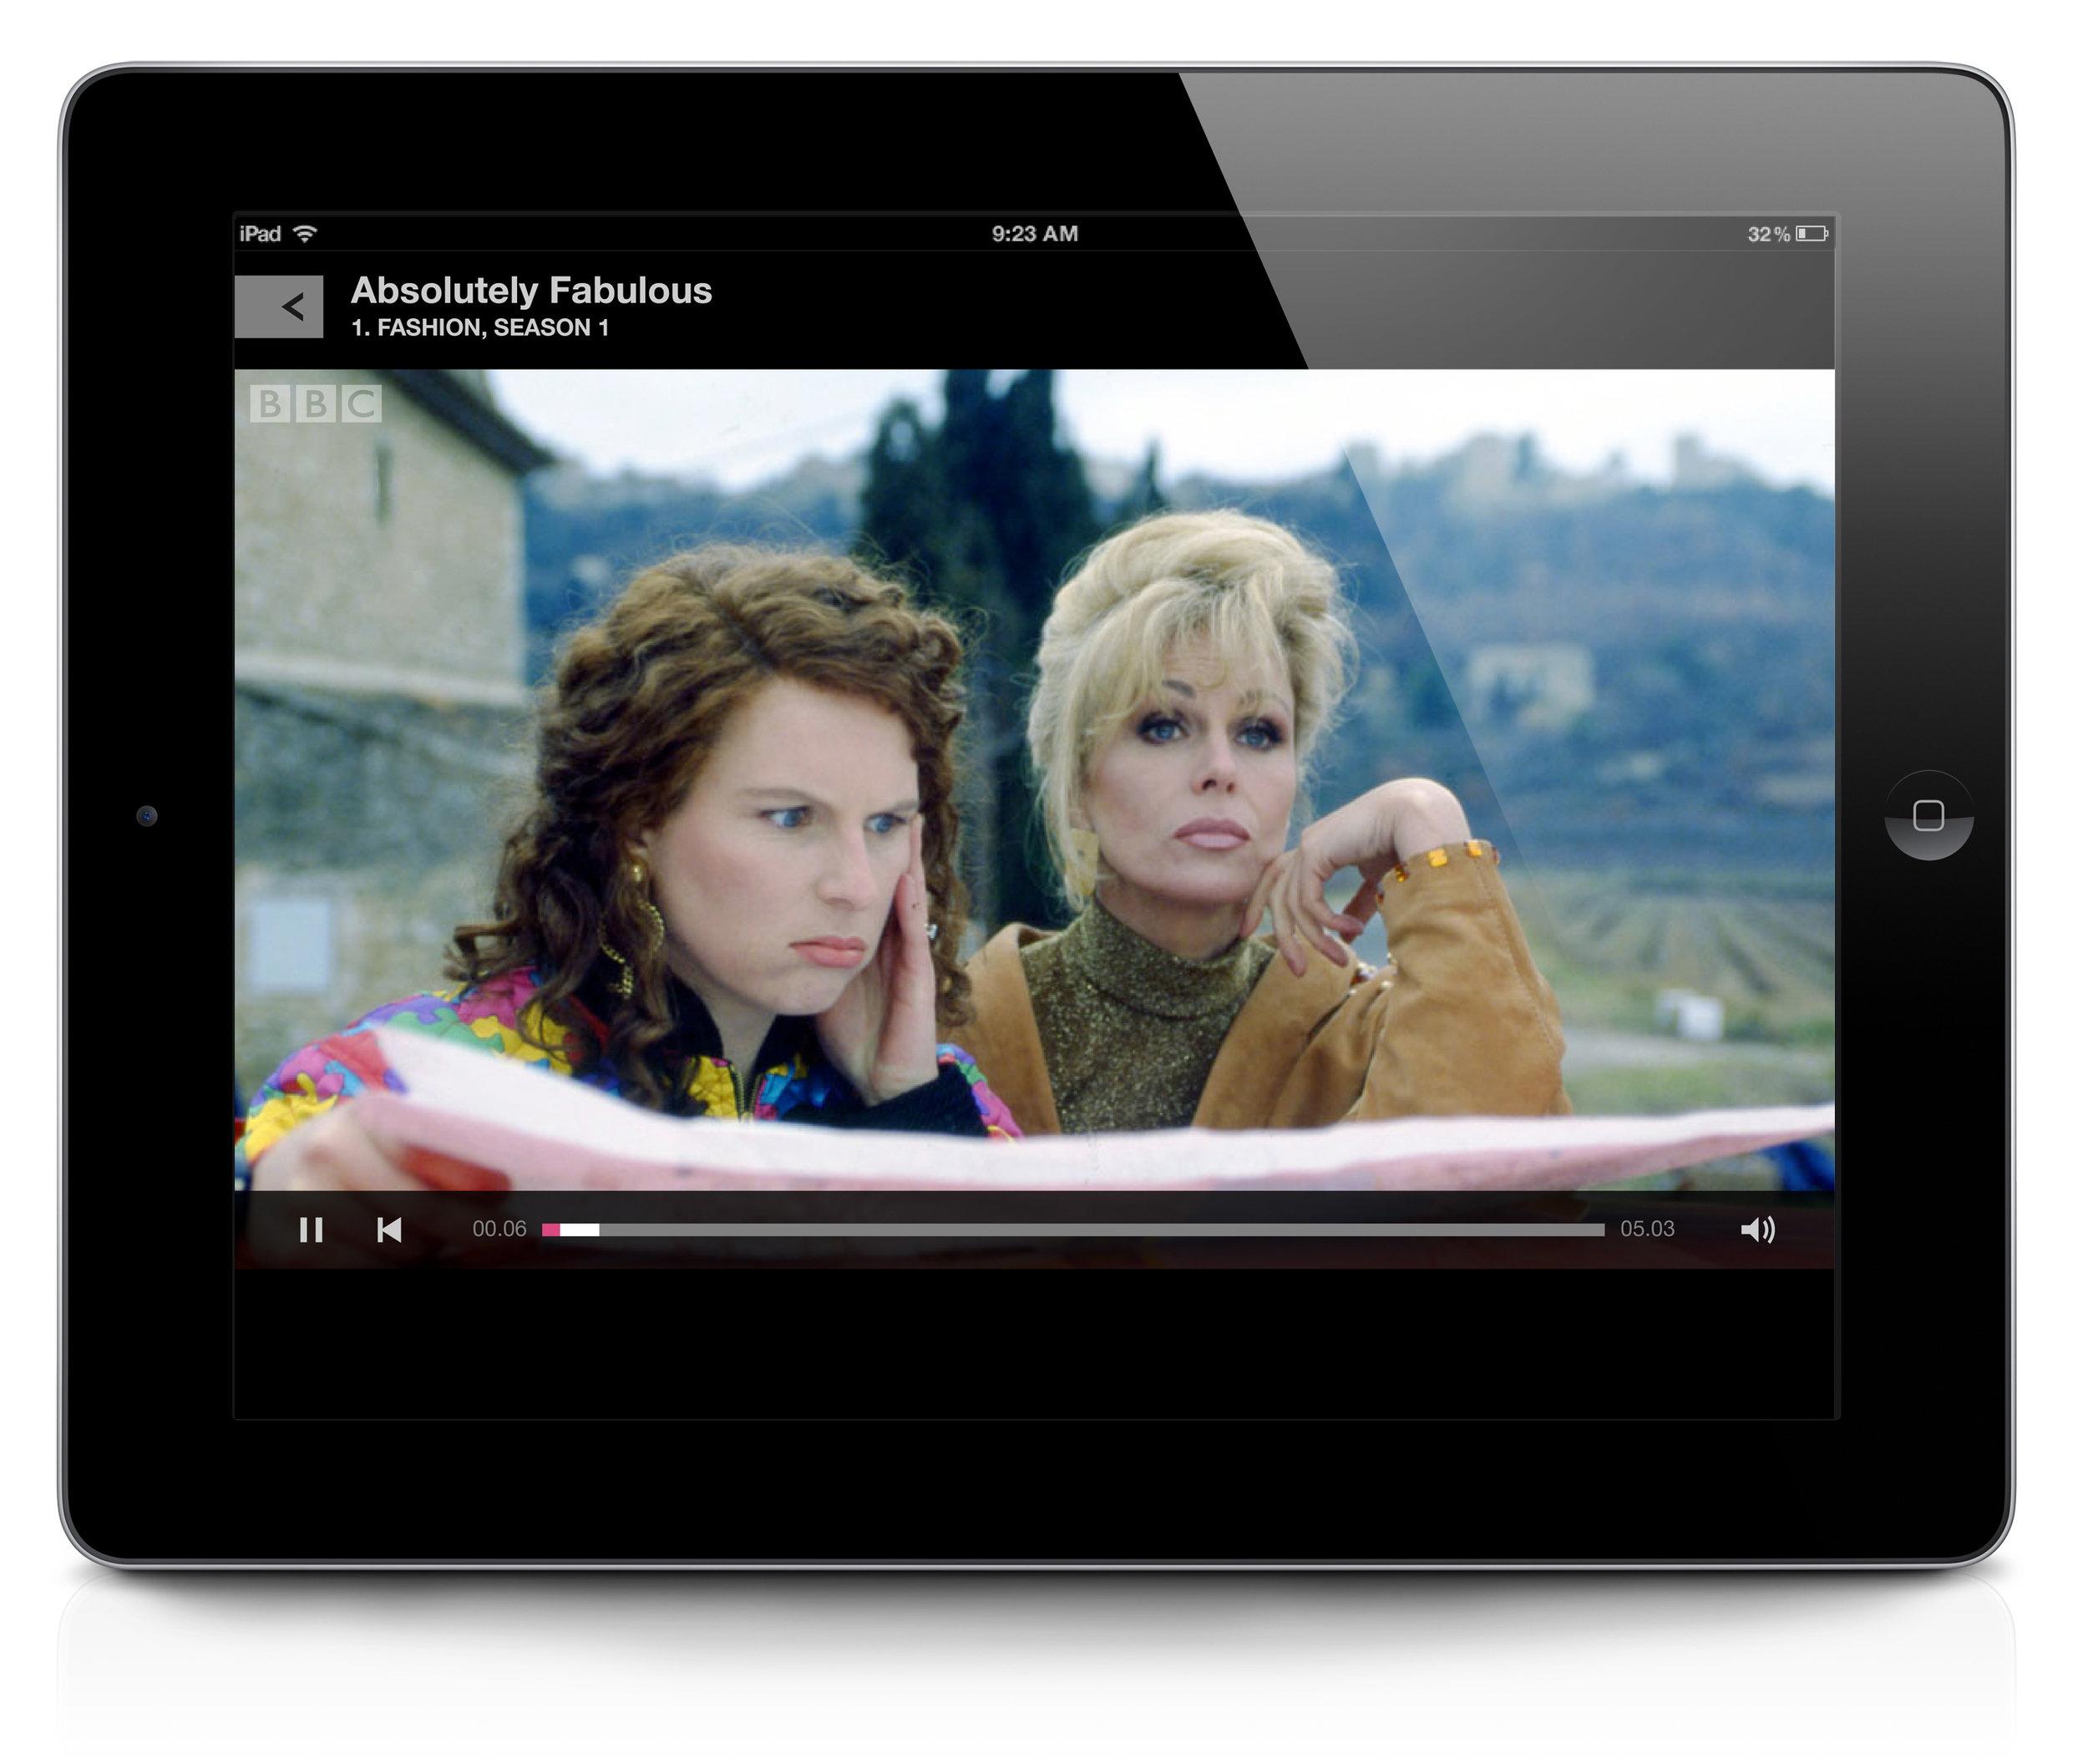 iPlayer_iPad2_player.jpg